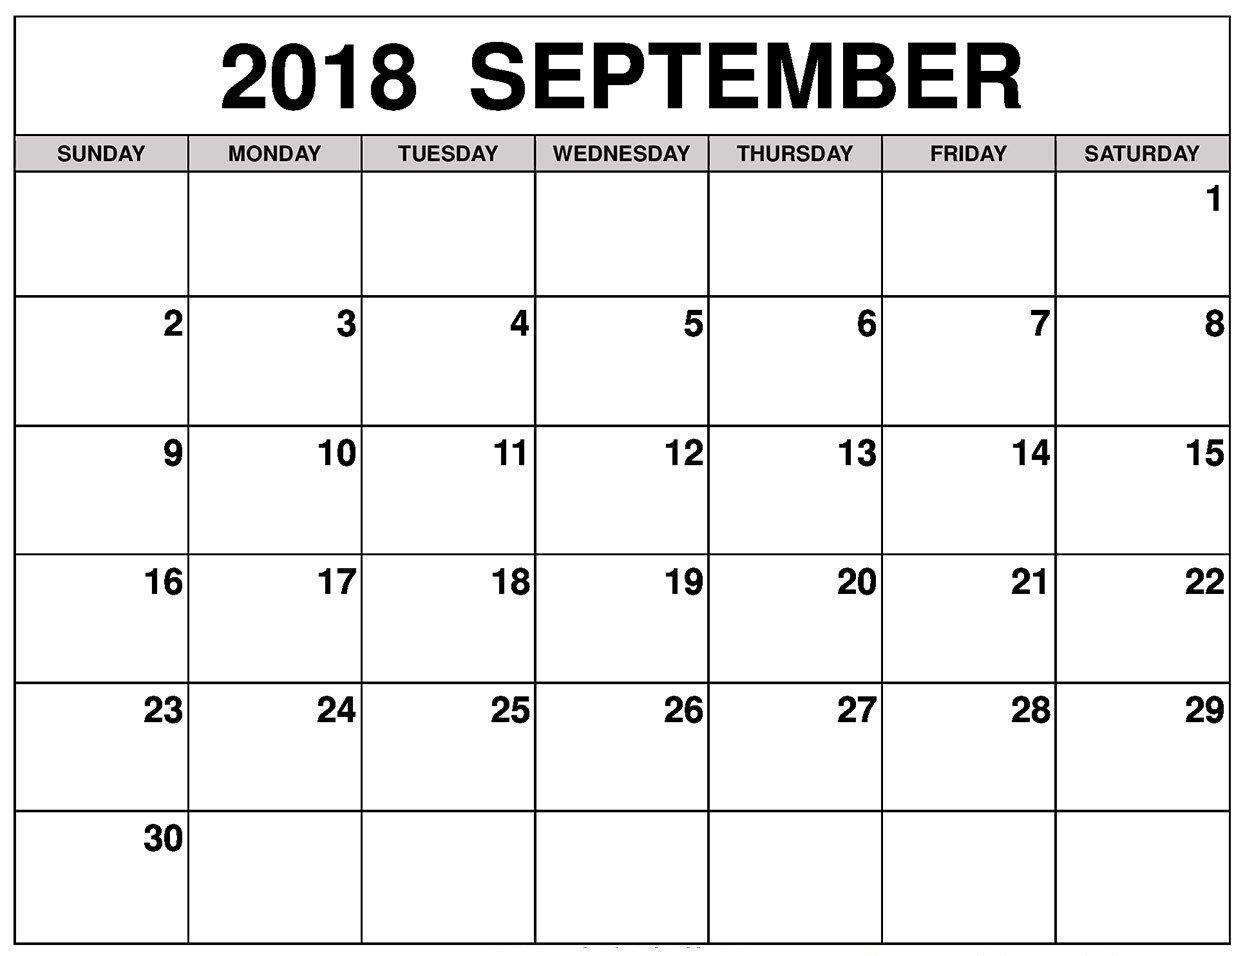 Free September Calendar 2018 Printable Template Pdf pertaining to Free Printable Calendars 2020 Waterproof